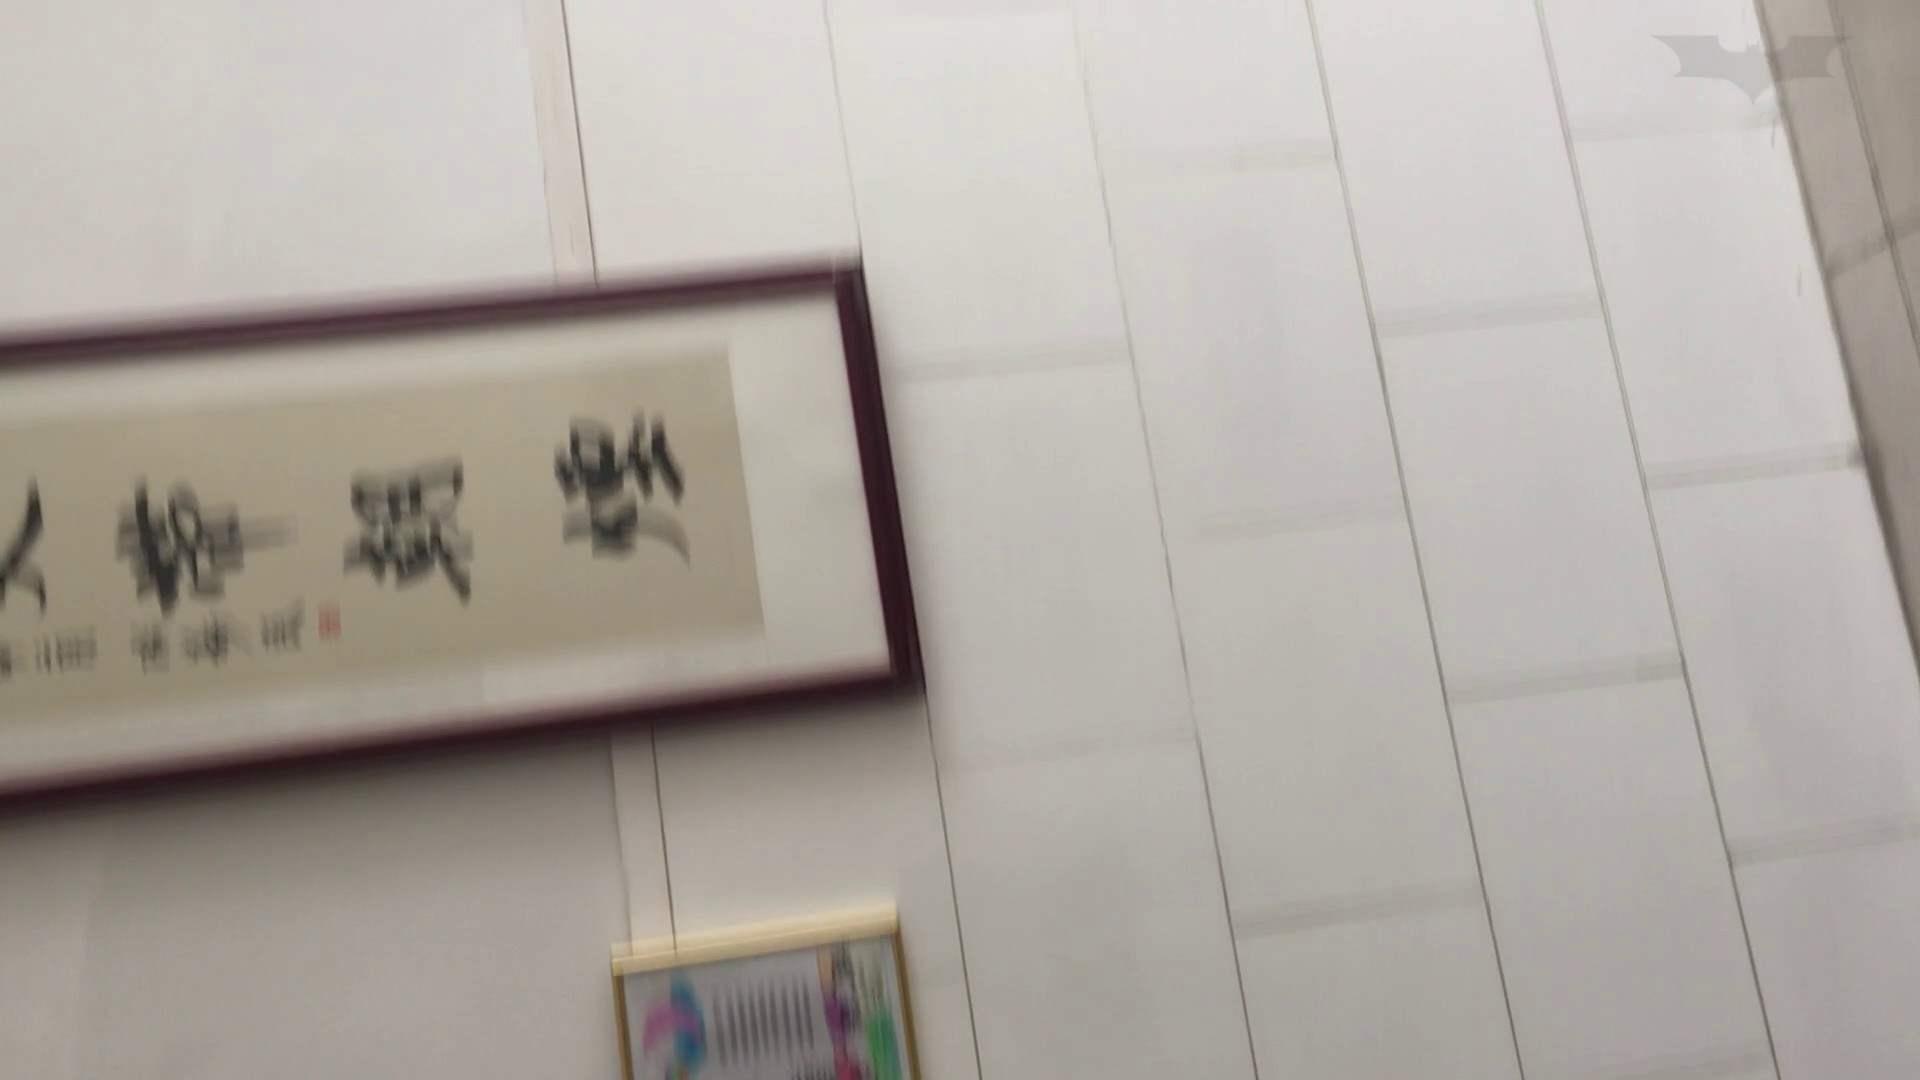 芸術大学ガチ潜入盗撮 JD盗撮 美女の洗面所の秘密 Vol.82 潜入 セックス無修正動画無料 83PIX 35